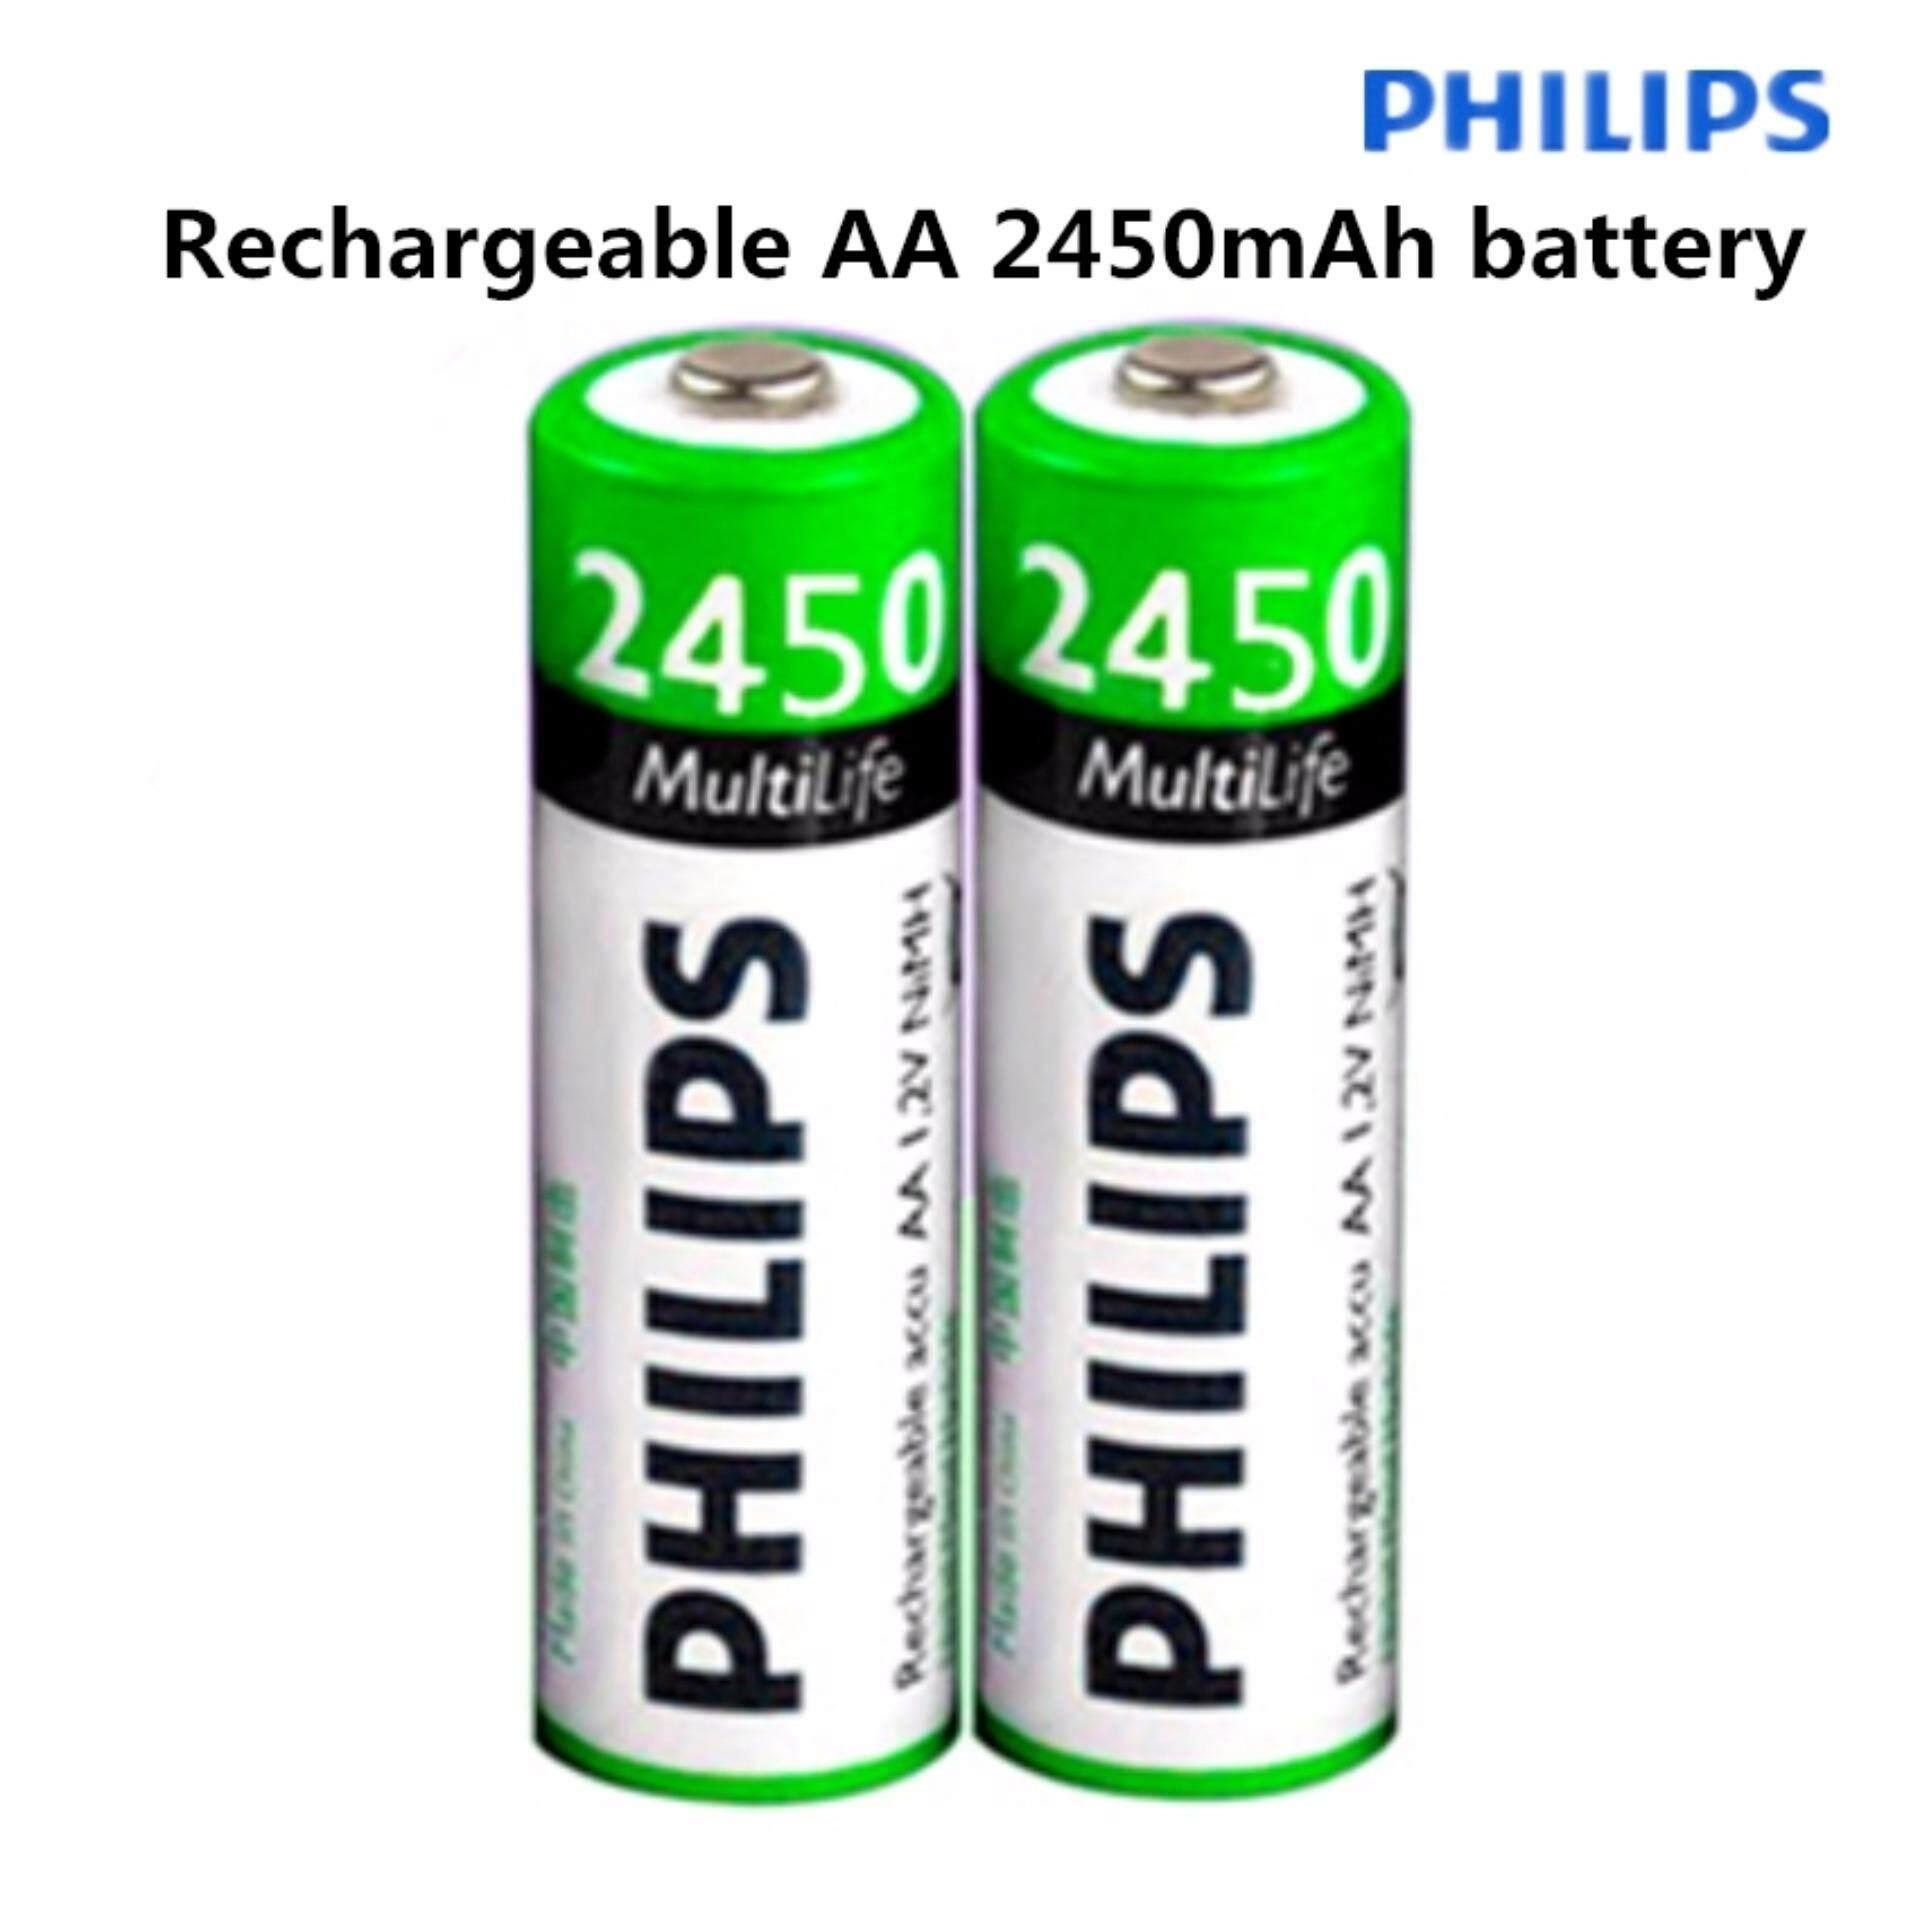 PHILIPS ถ่านชาร์จ AA 2450 mAh NIMH Rechargeable Battery 2 ก้อน